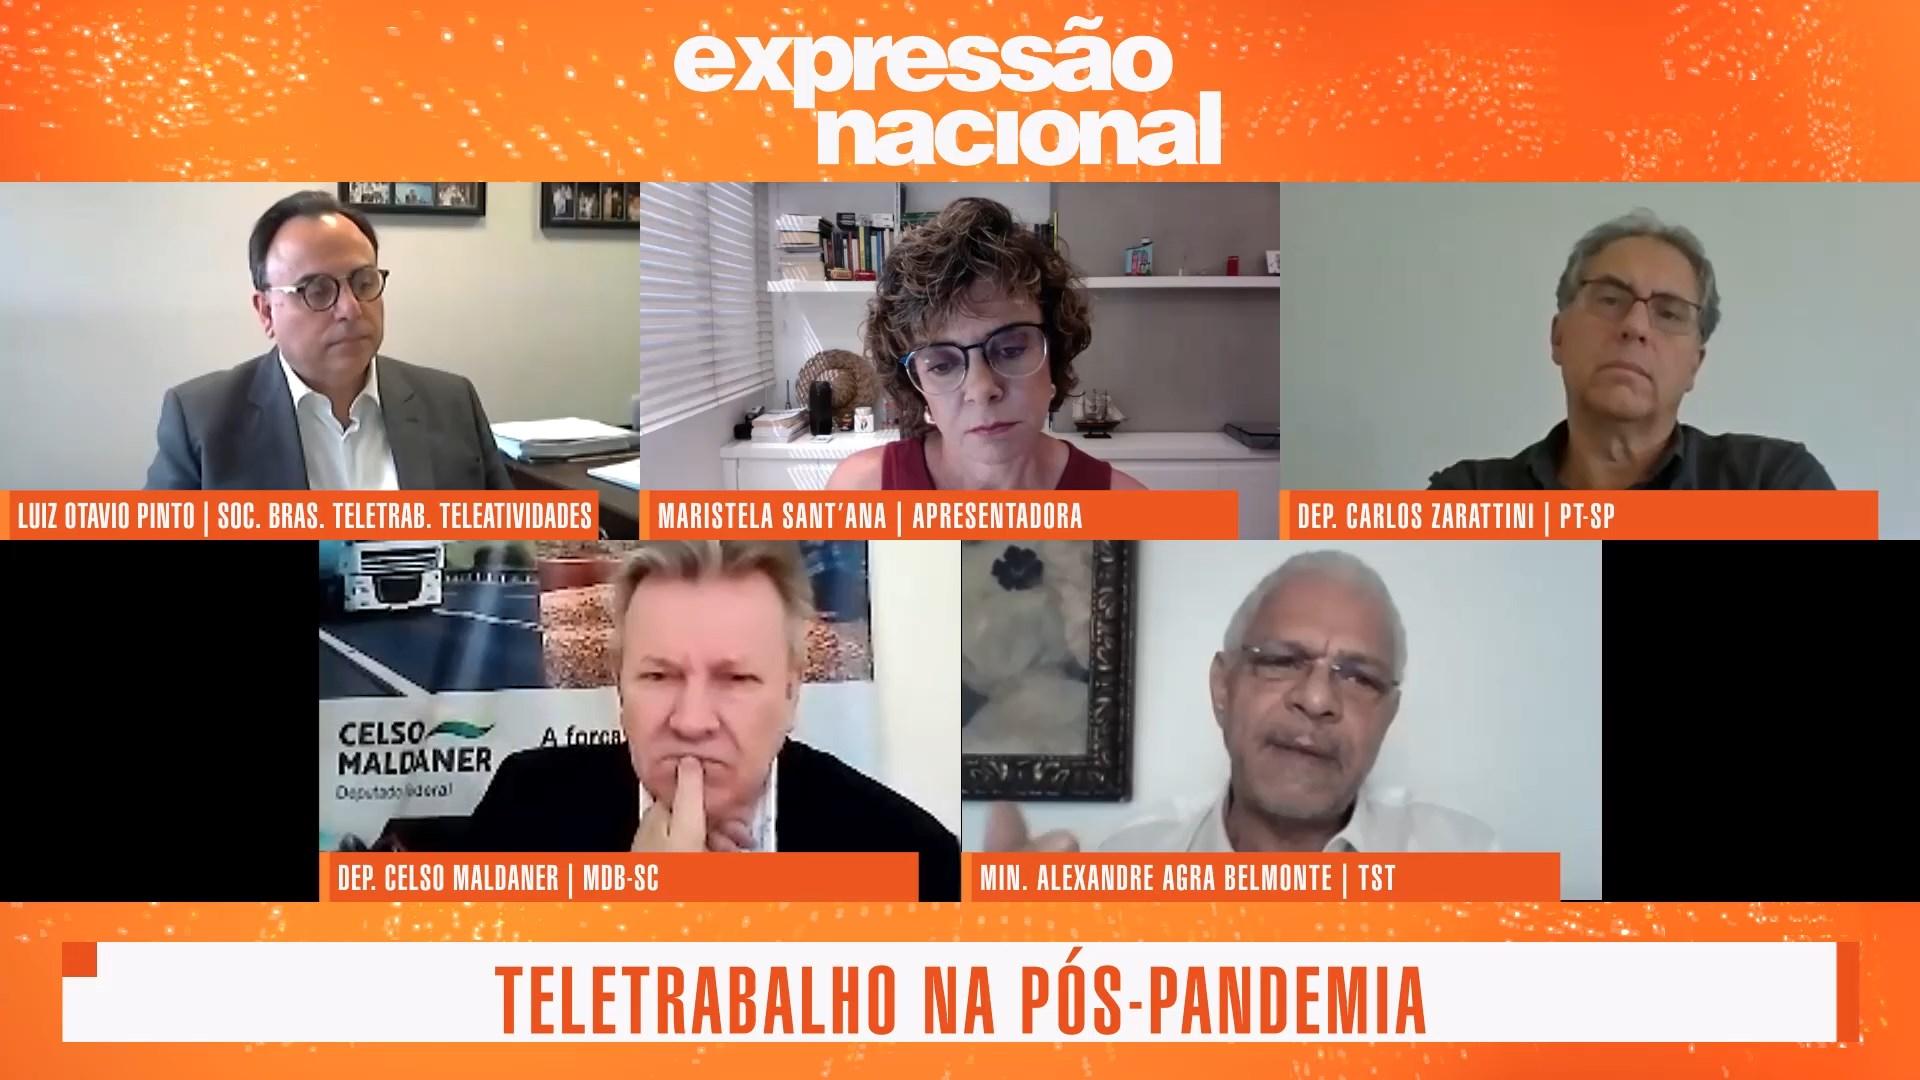 Teletrabalho pós-pandemia